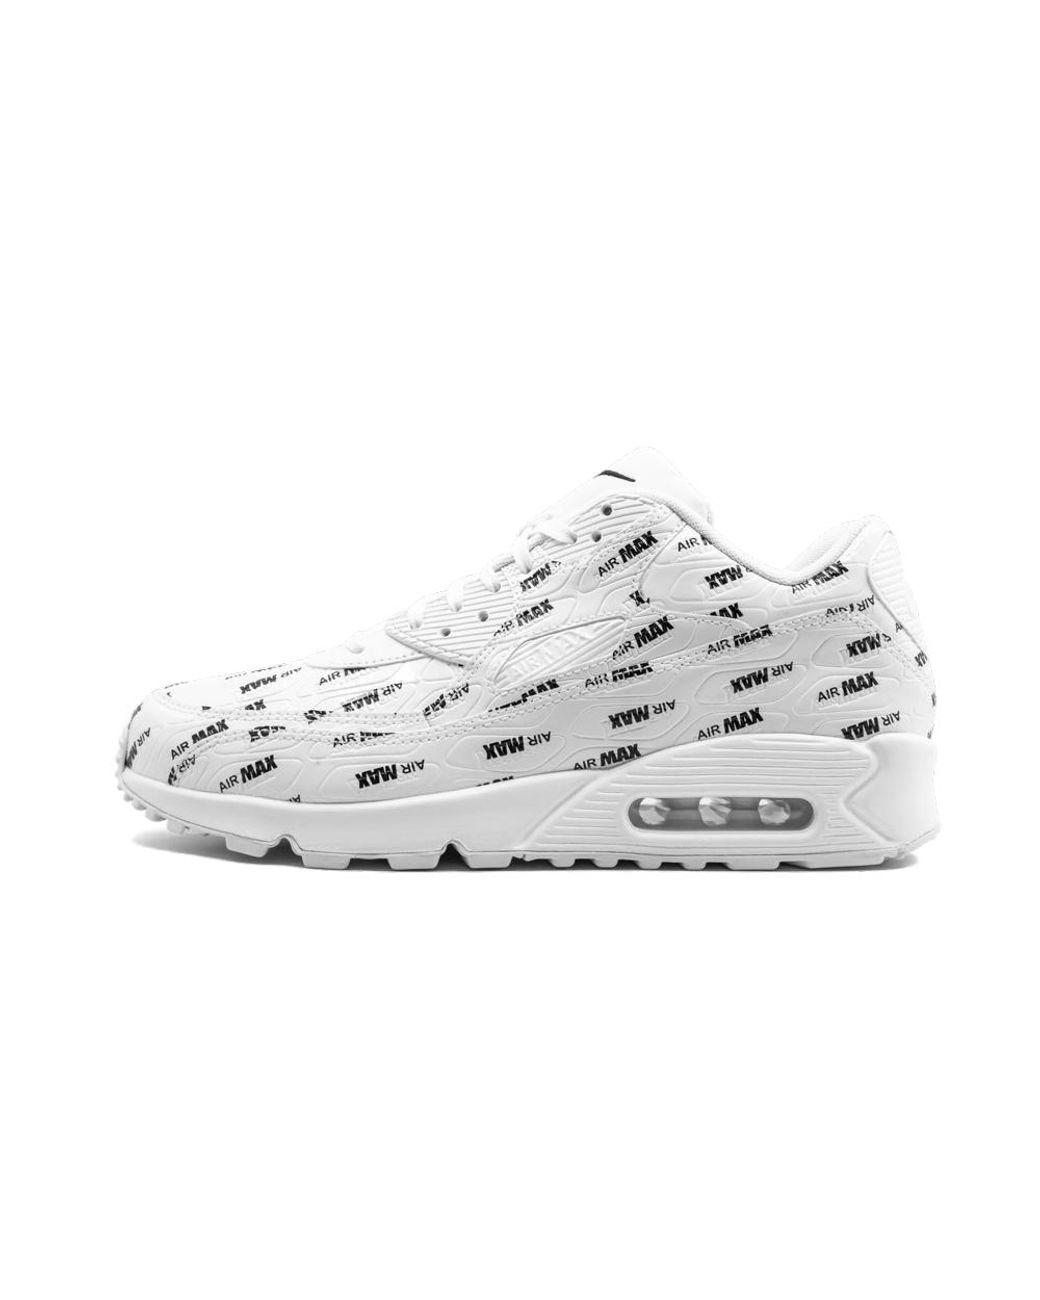 Nike Air Max 90 Premium Patent Black Women's 10